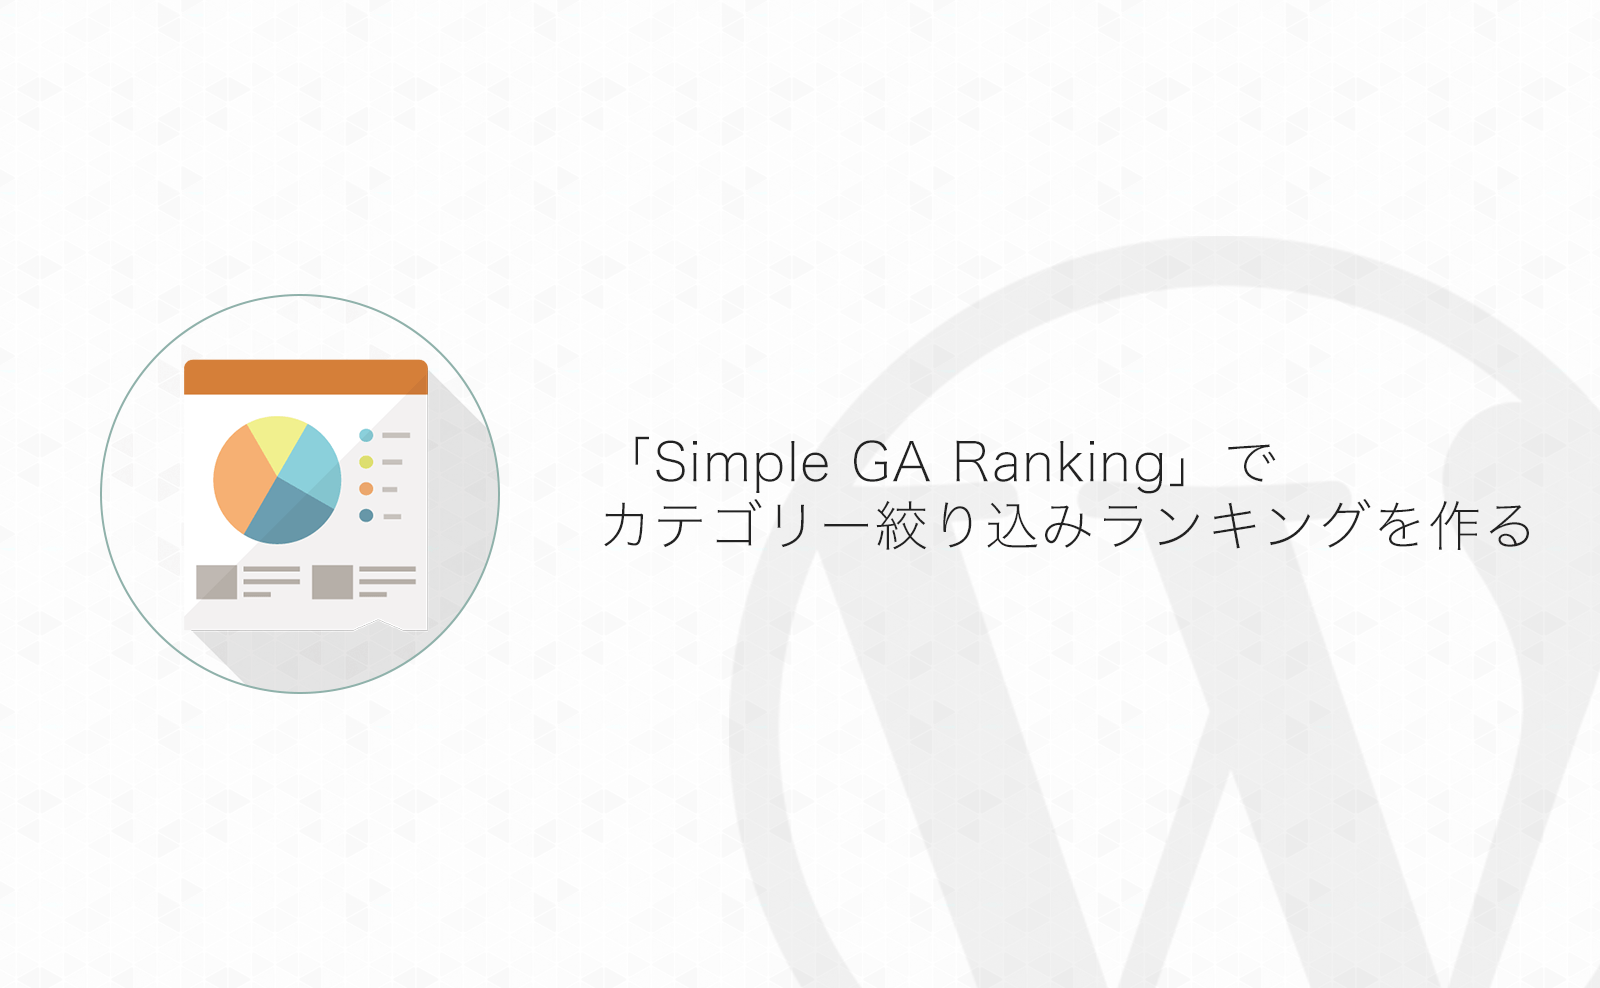 【WordPress】「Simple GA Ranking」で同じカテゴリーの人気記事ランキングを作る方法